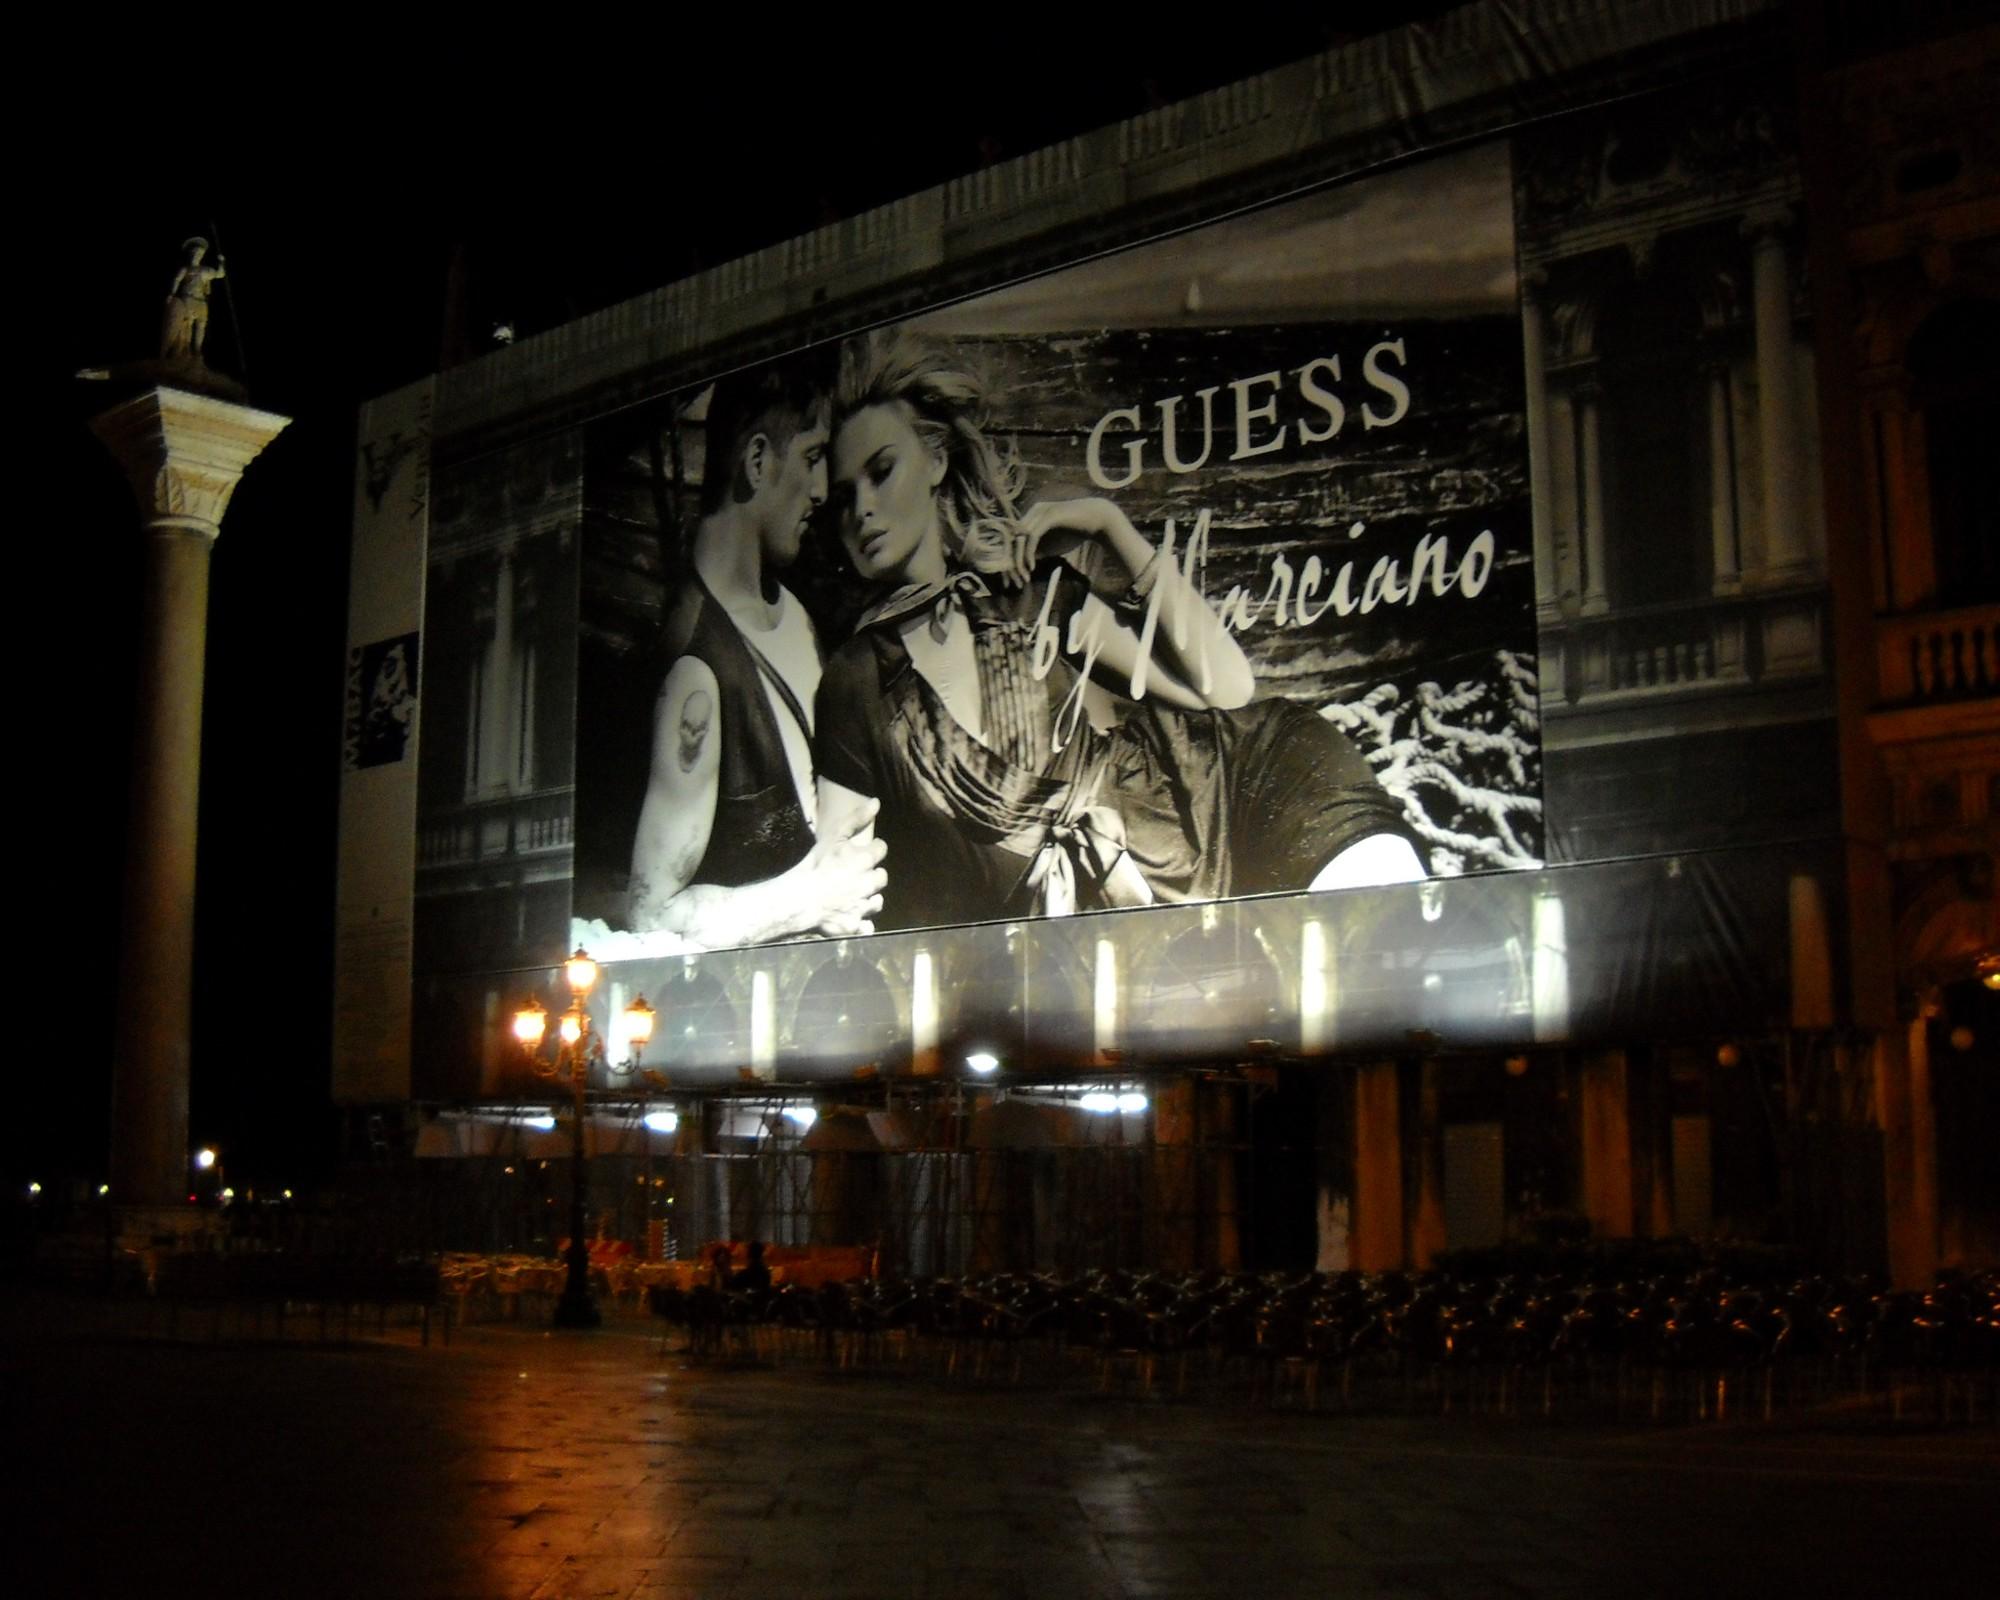 Piazza Guess by Marciano - Venezia